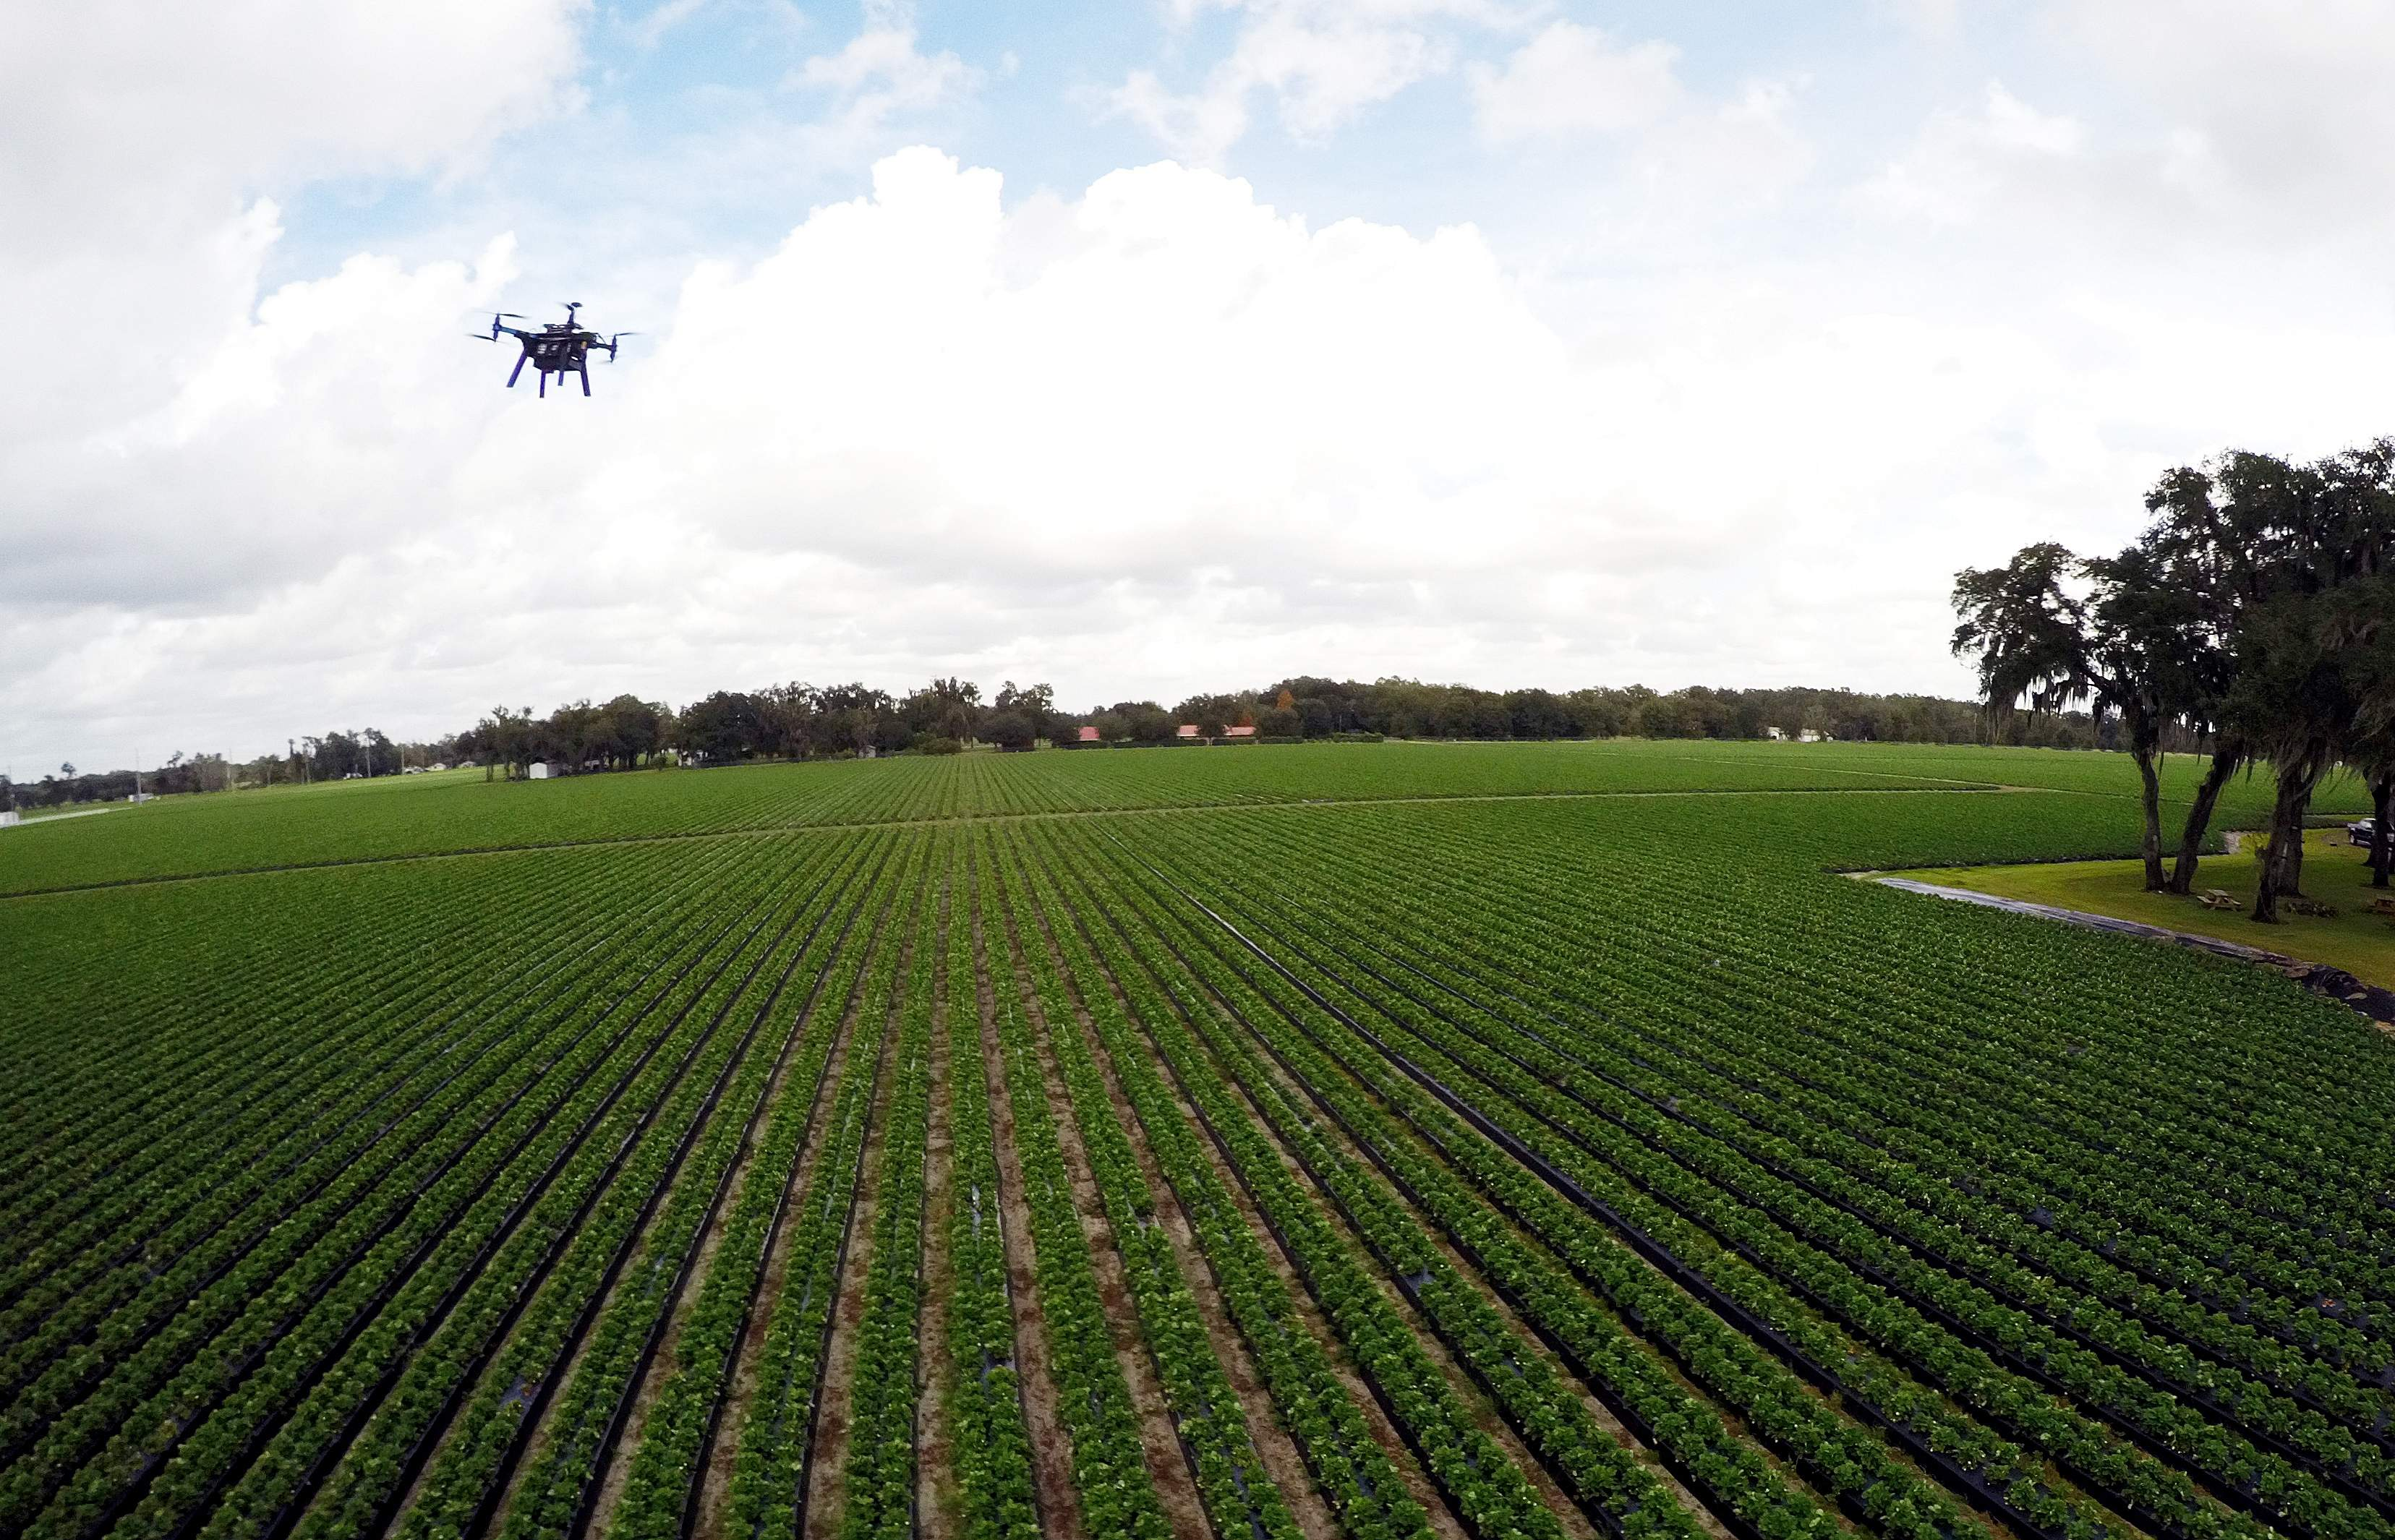 drones 1.jpg